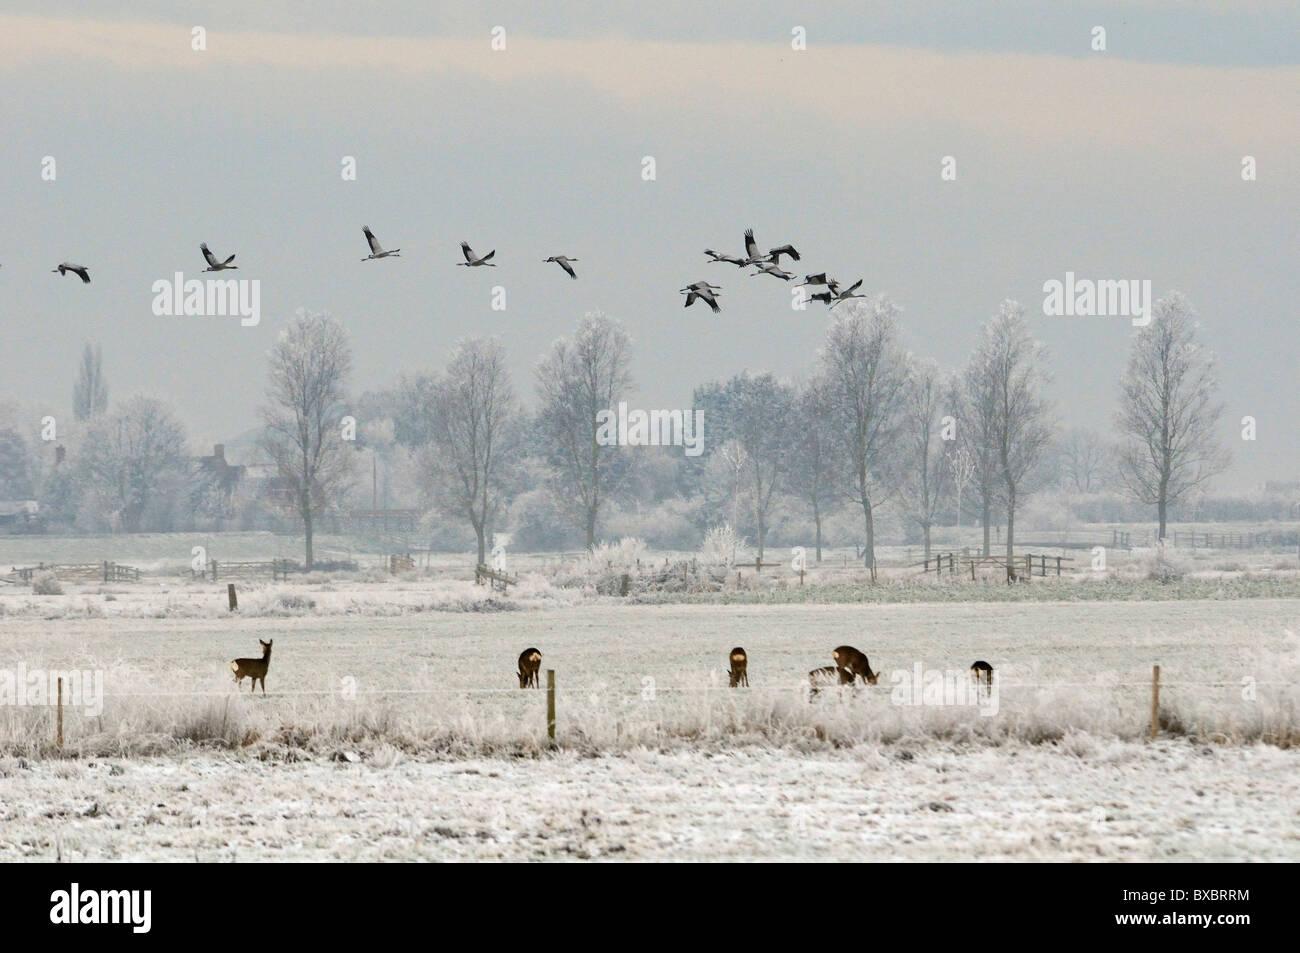 Flock of Juvenile Common / Eurasian cranes (Grus grus) flying over snowy pastureland and grazing Roe deer (Capreolus - Stock Image